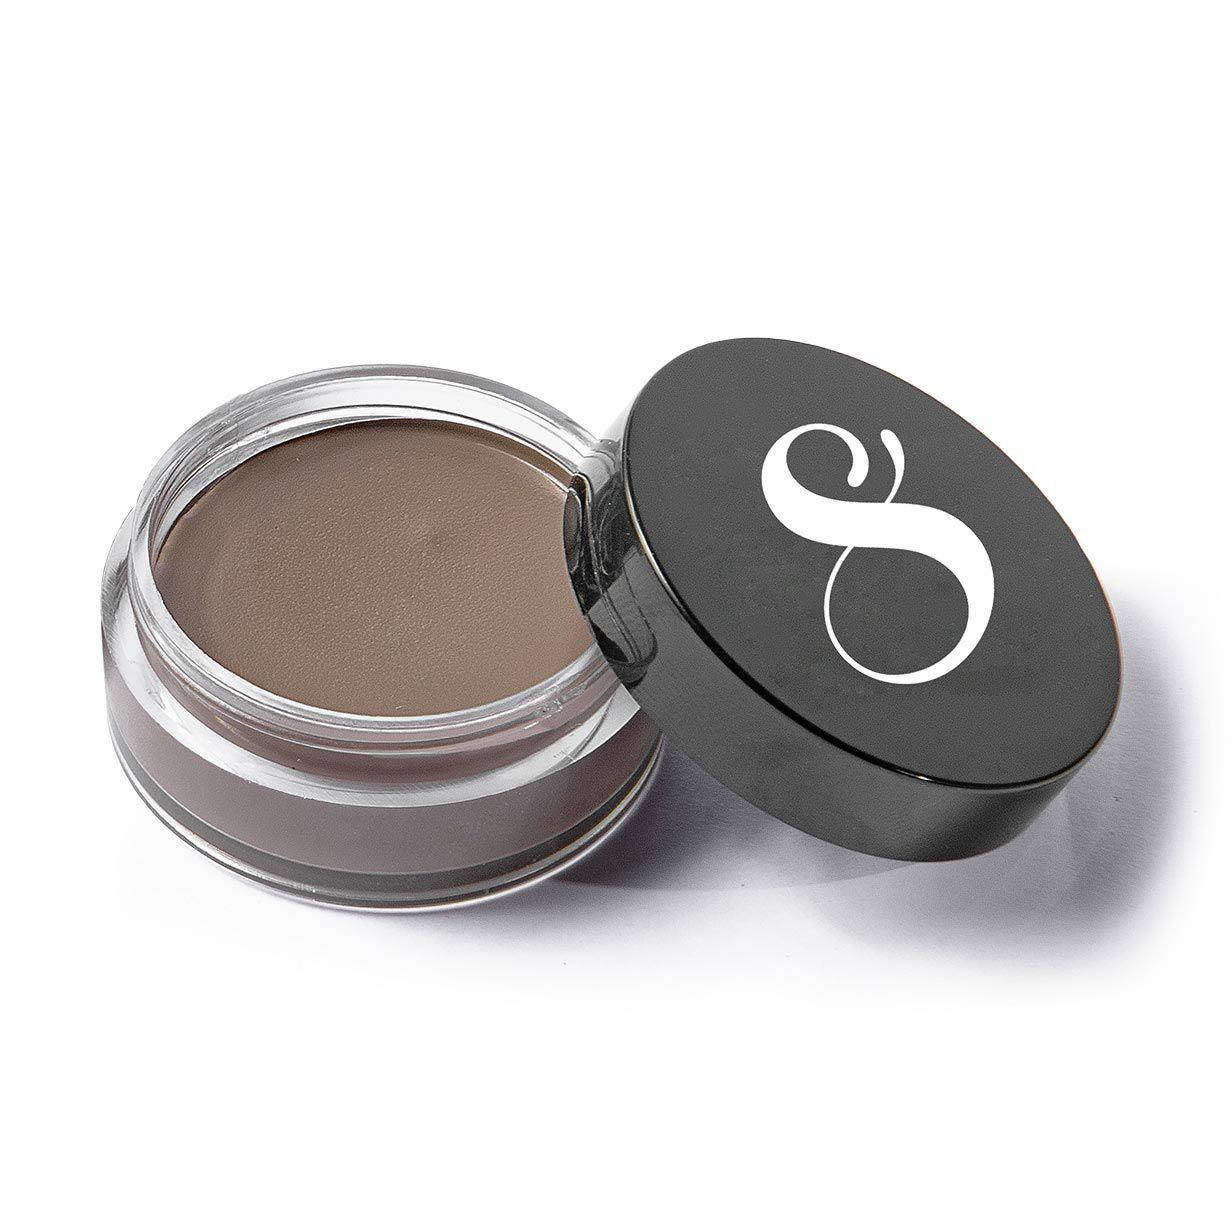 Corretivo para Sobrancelha Suelen Makeup SM15  - SUELEN MAKEUP